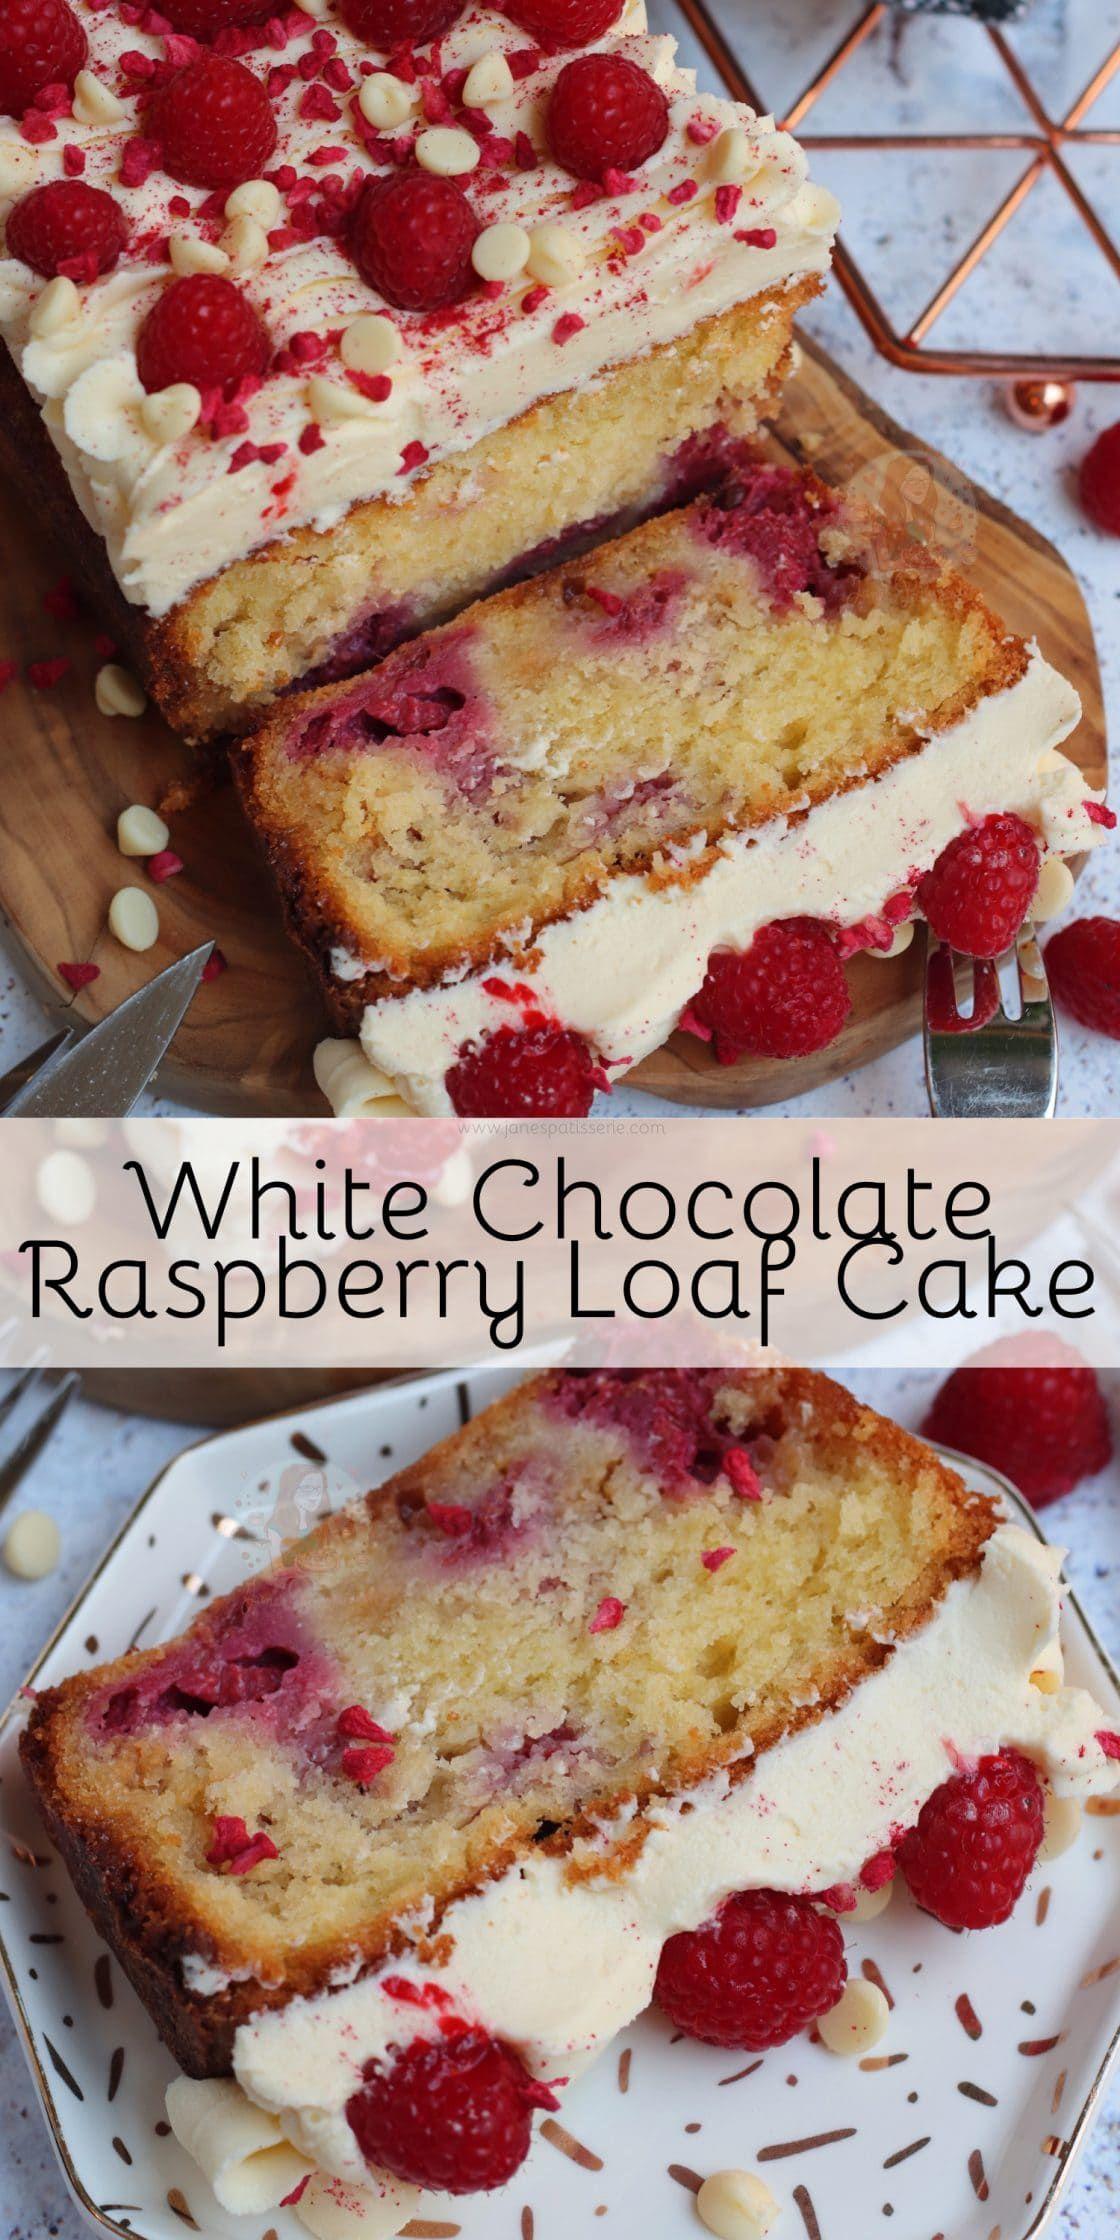 White Chocolate Raspberry Loaf Cake! - Jane's Patisserie